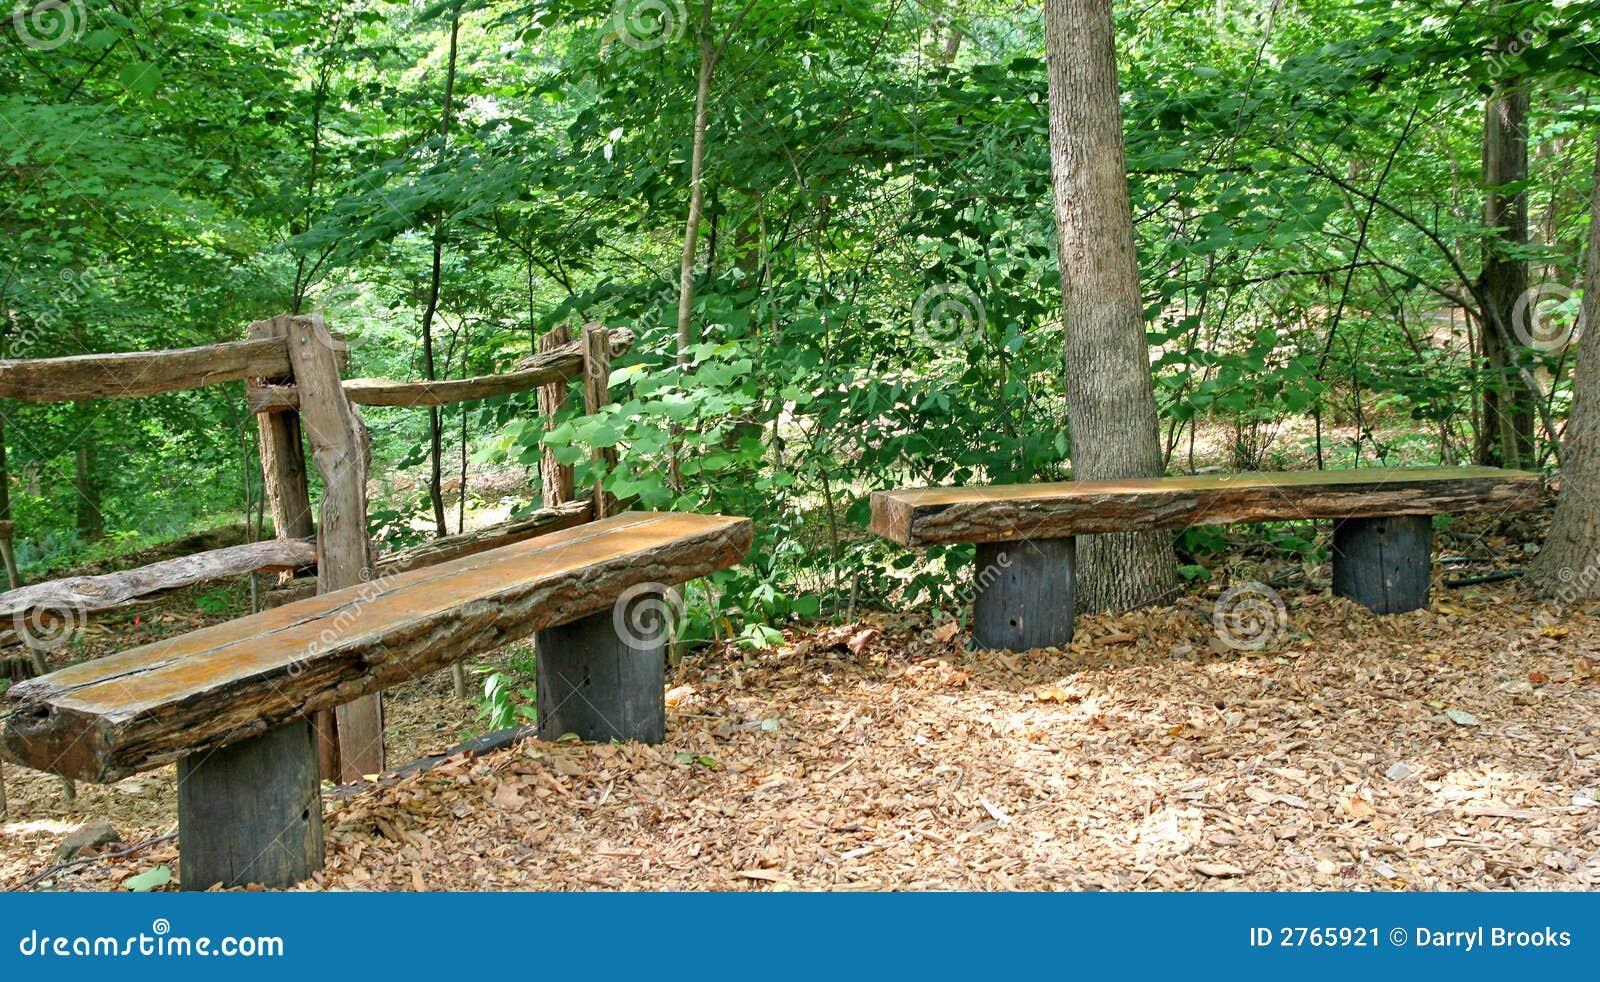 banco de jardim vetor:Natural Log Bench